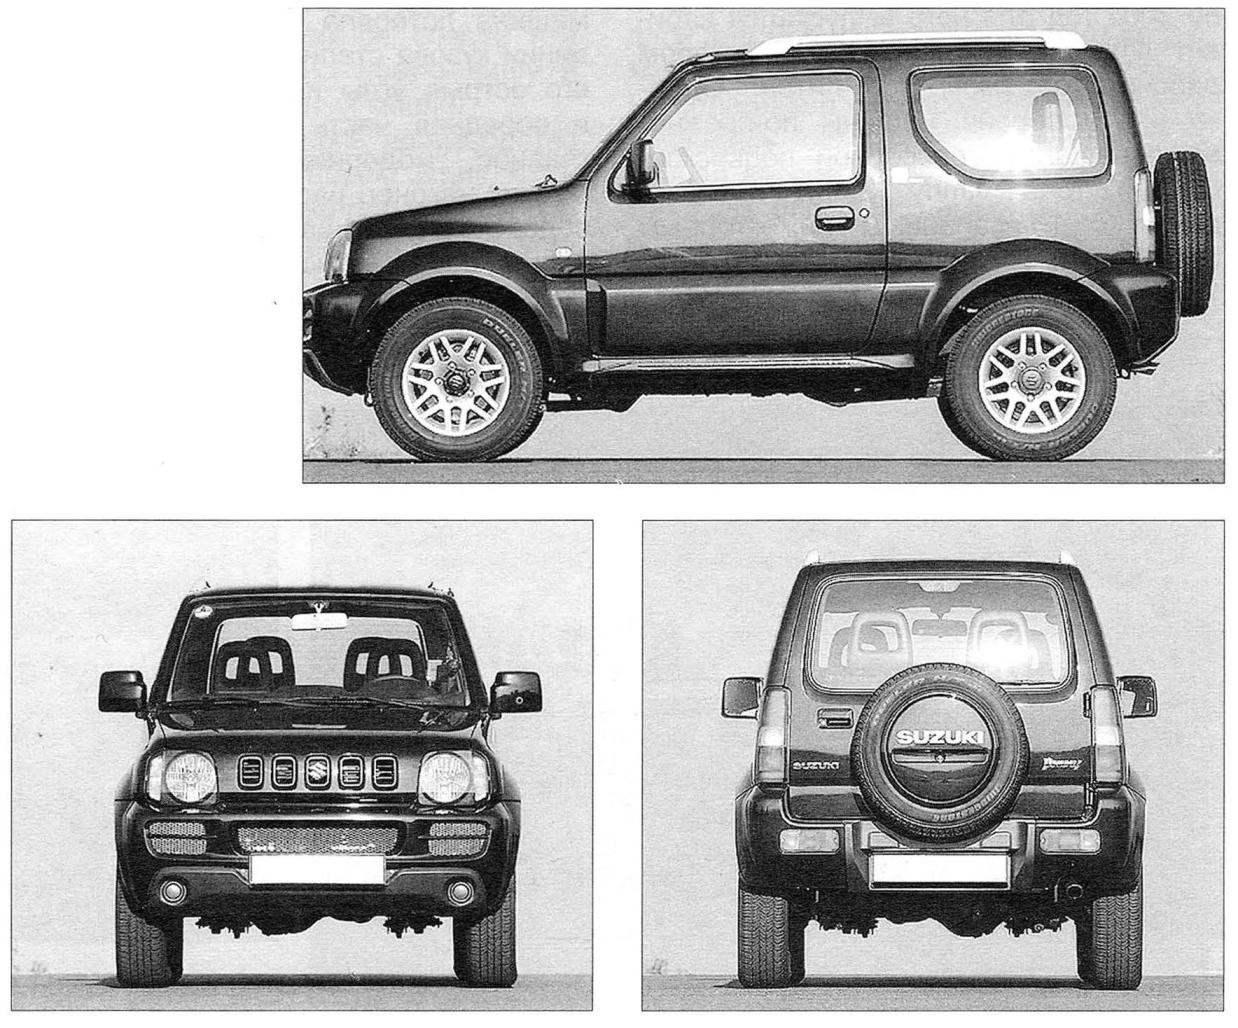 Мини-джип Suzuki Jimny (вид сбоку, спереди и сзади)